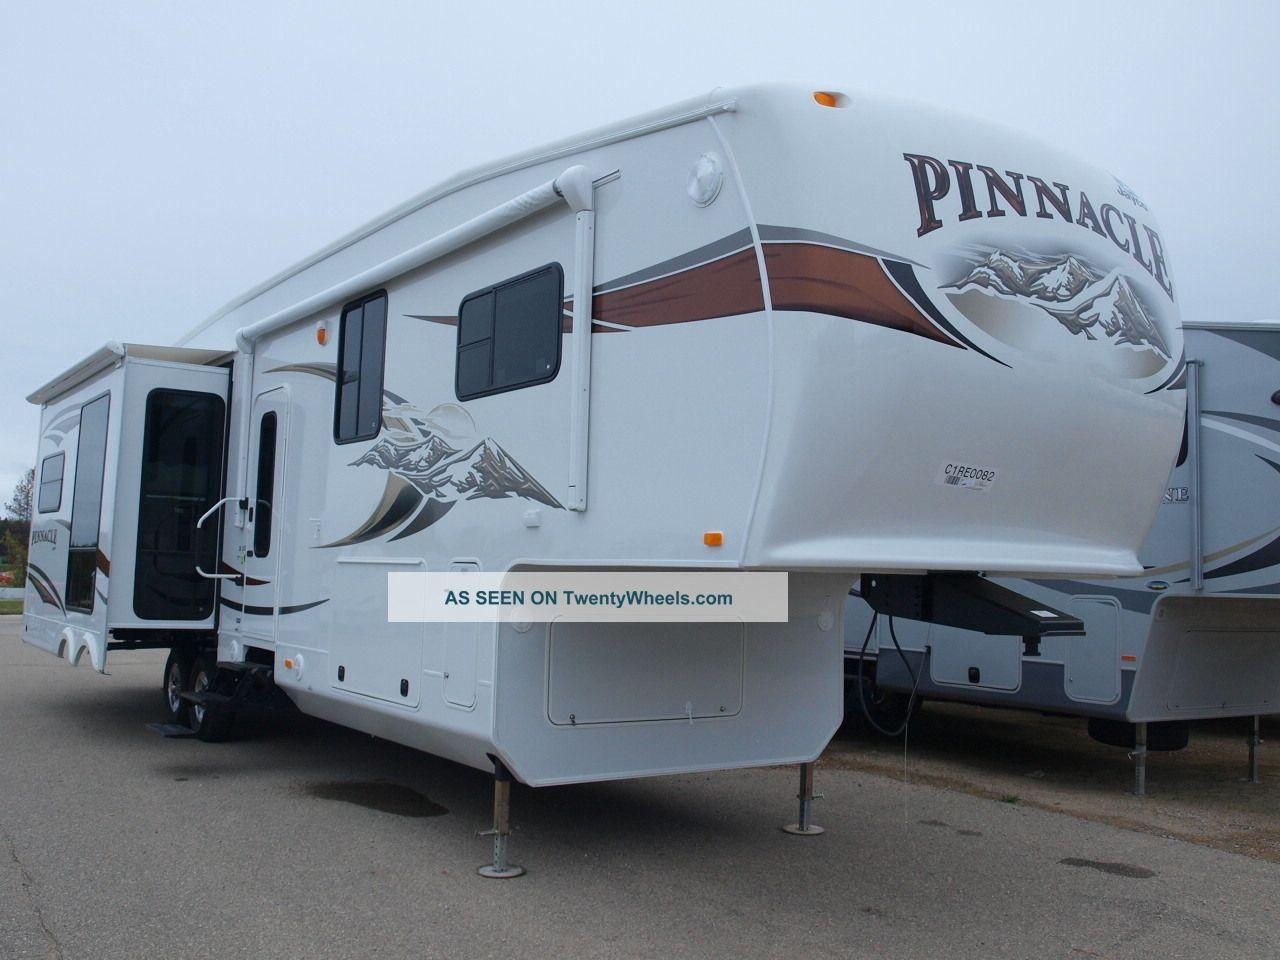 2012 Jayco Pinnacle 35lkts Fifth Wheel RVs photo